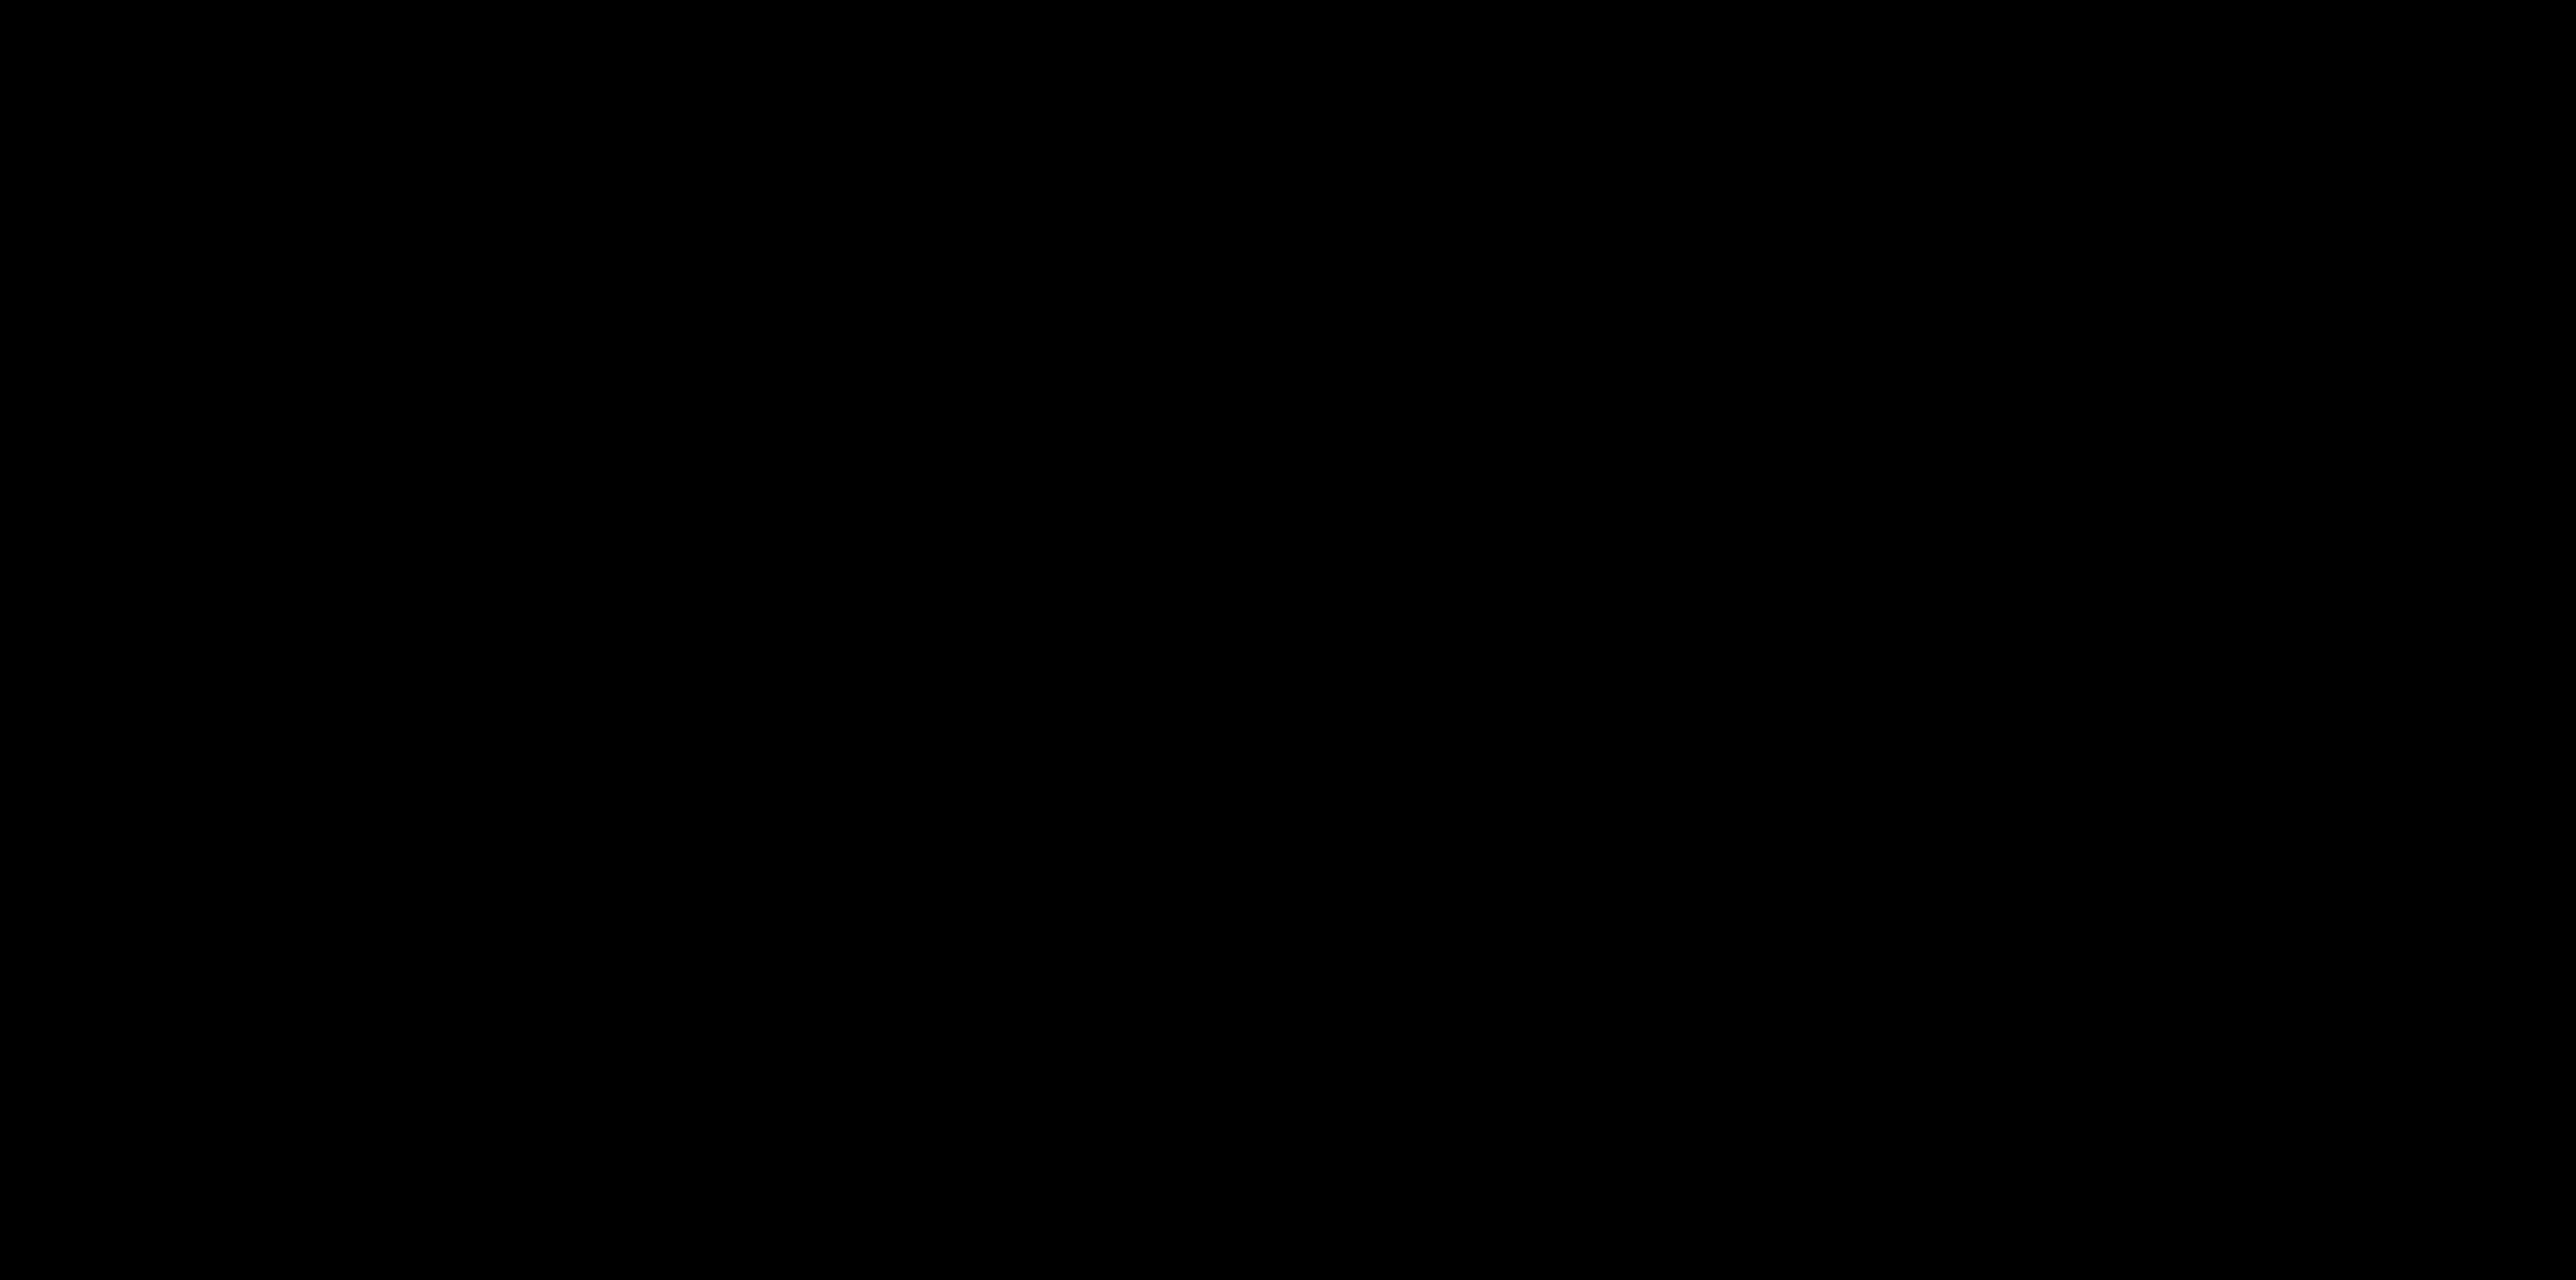 Sasuke Lineart : Sasuke uchiha lineart by alexpetrow on deviantart